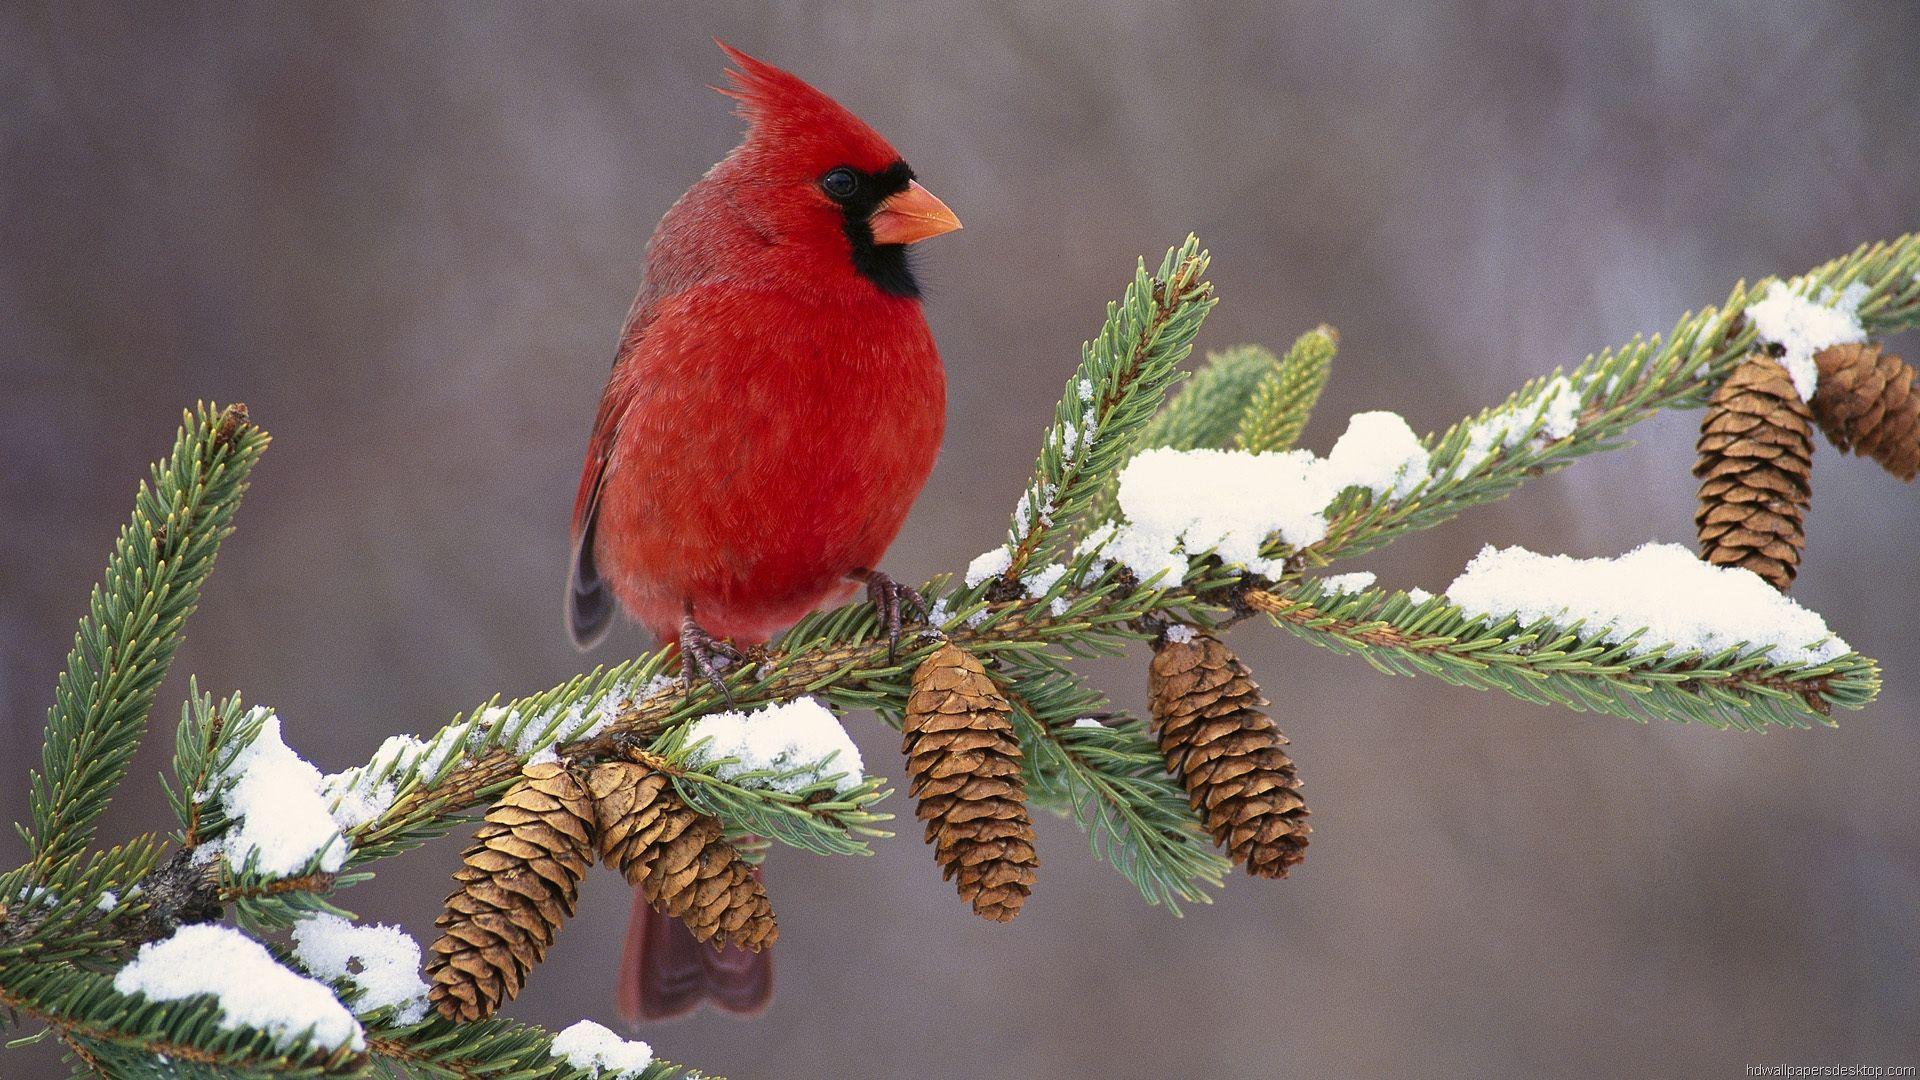 Winter Birds Wallpaper HD Wallpapers 1080p HD